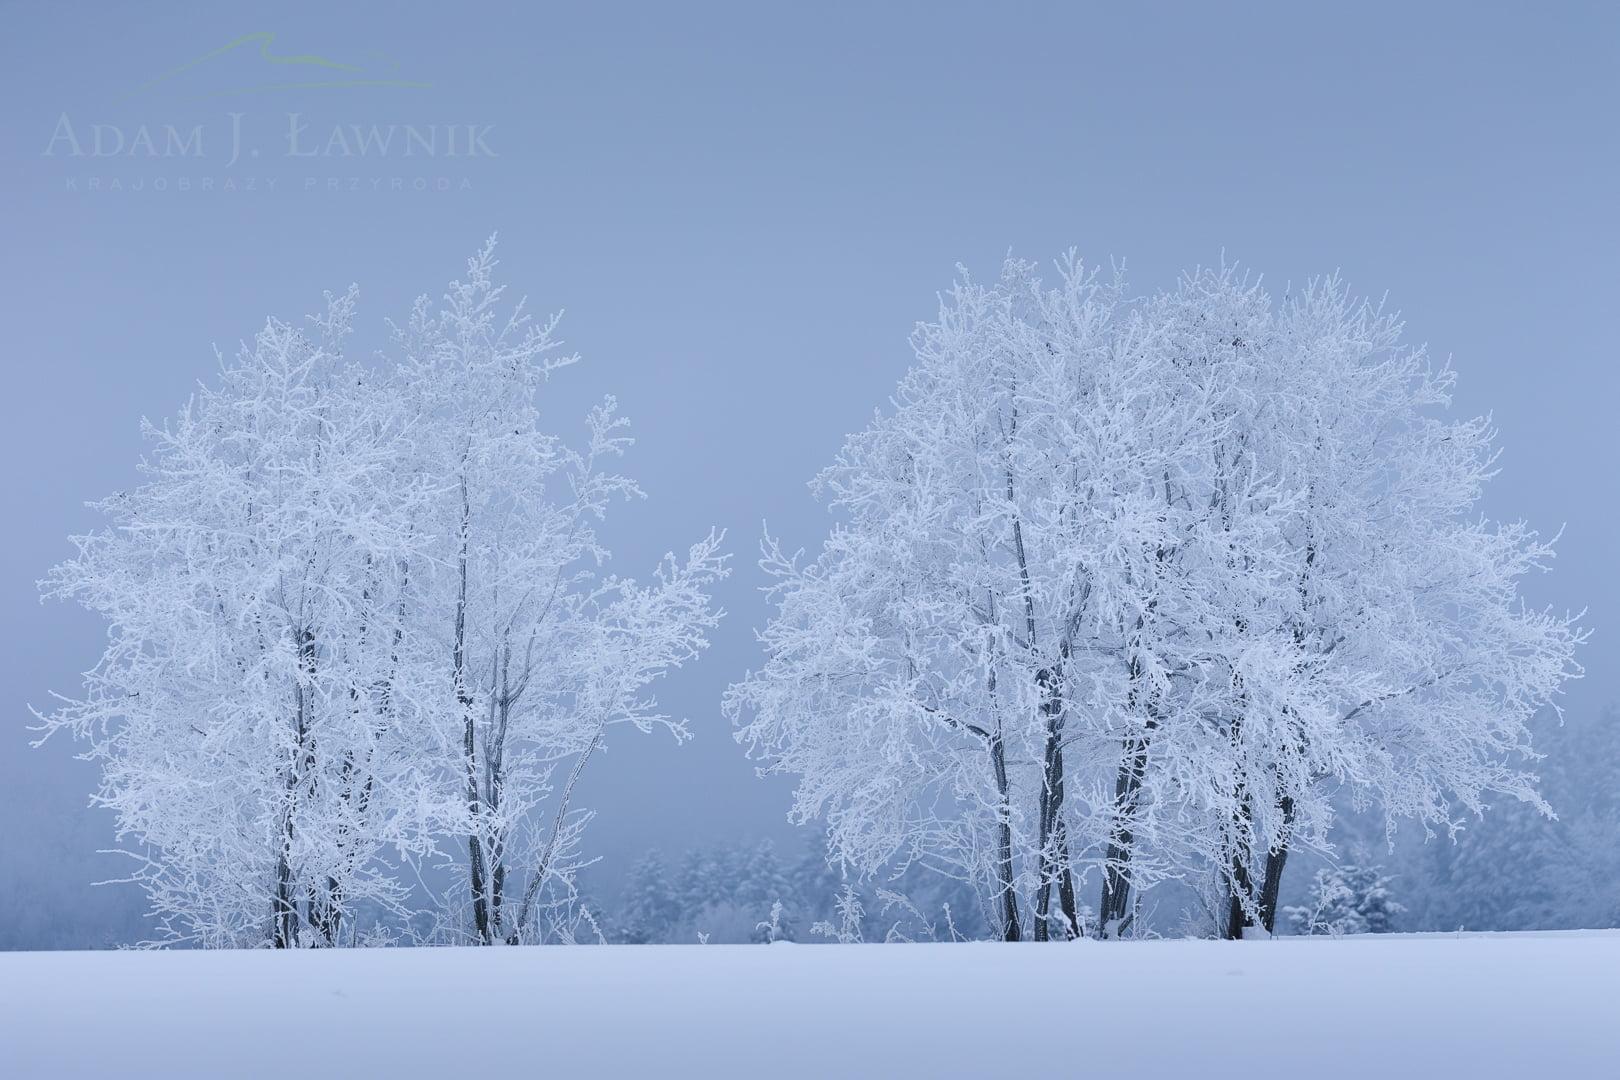 Turnica National Park, Poland 1701-00120C